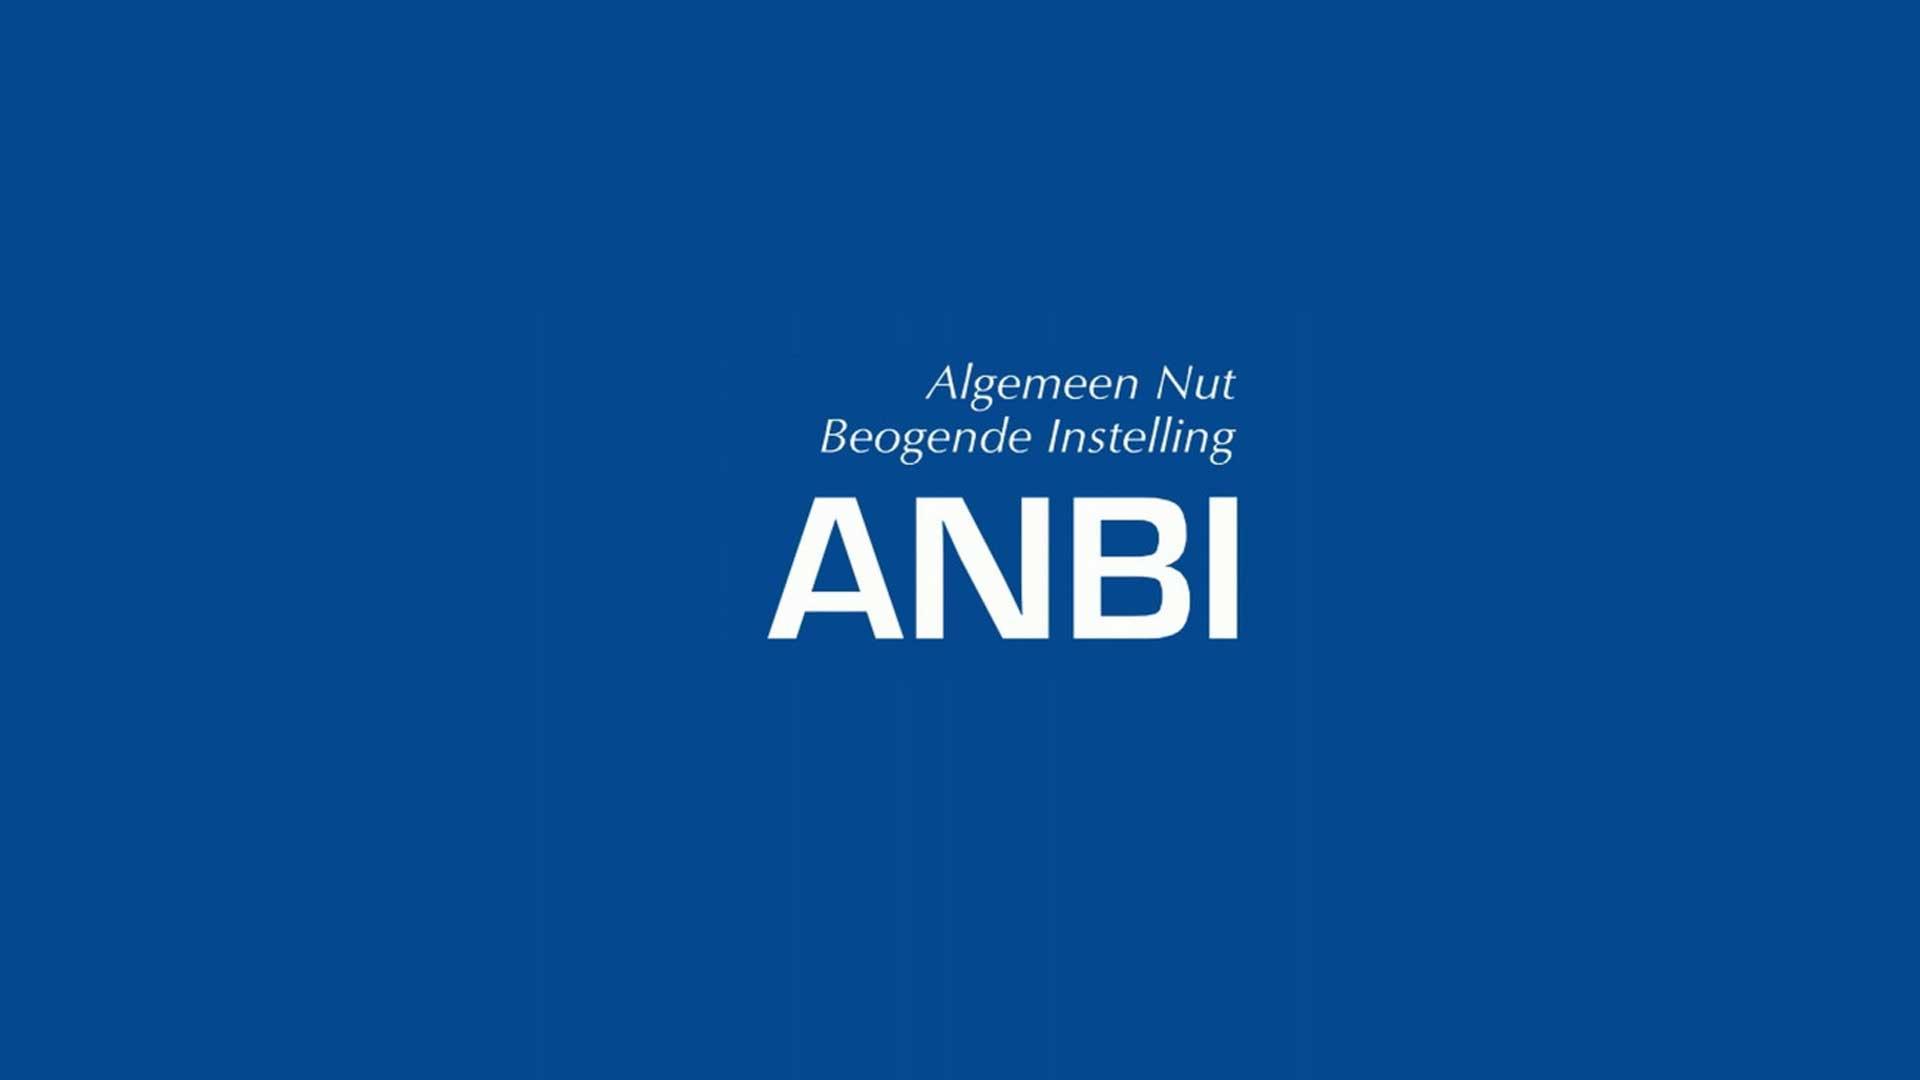 Louwman Museum algemeen nut beogende instelling ANBI